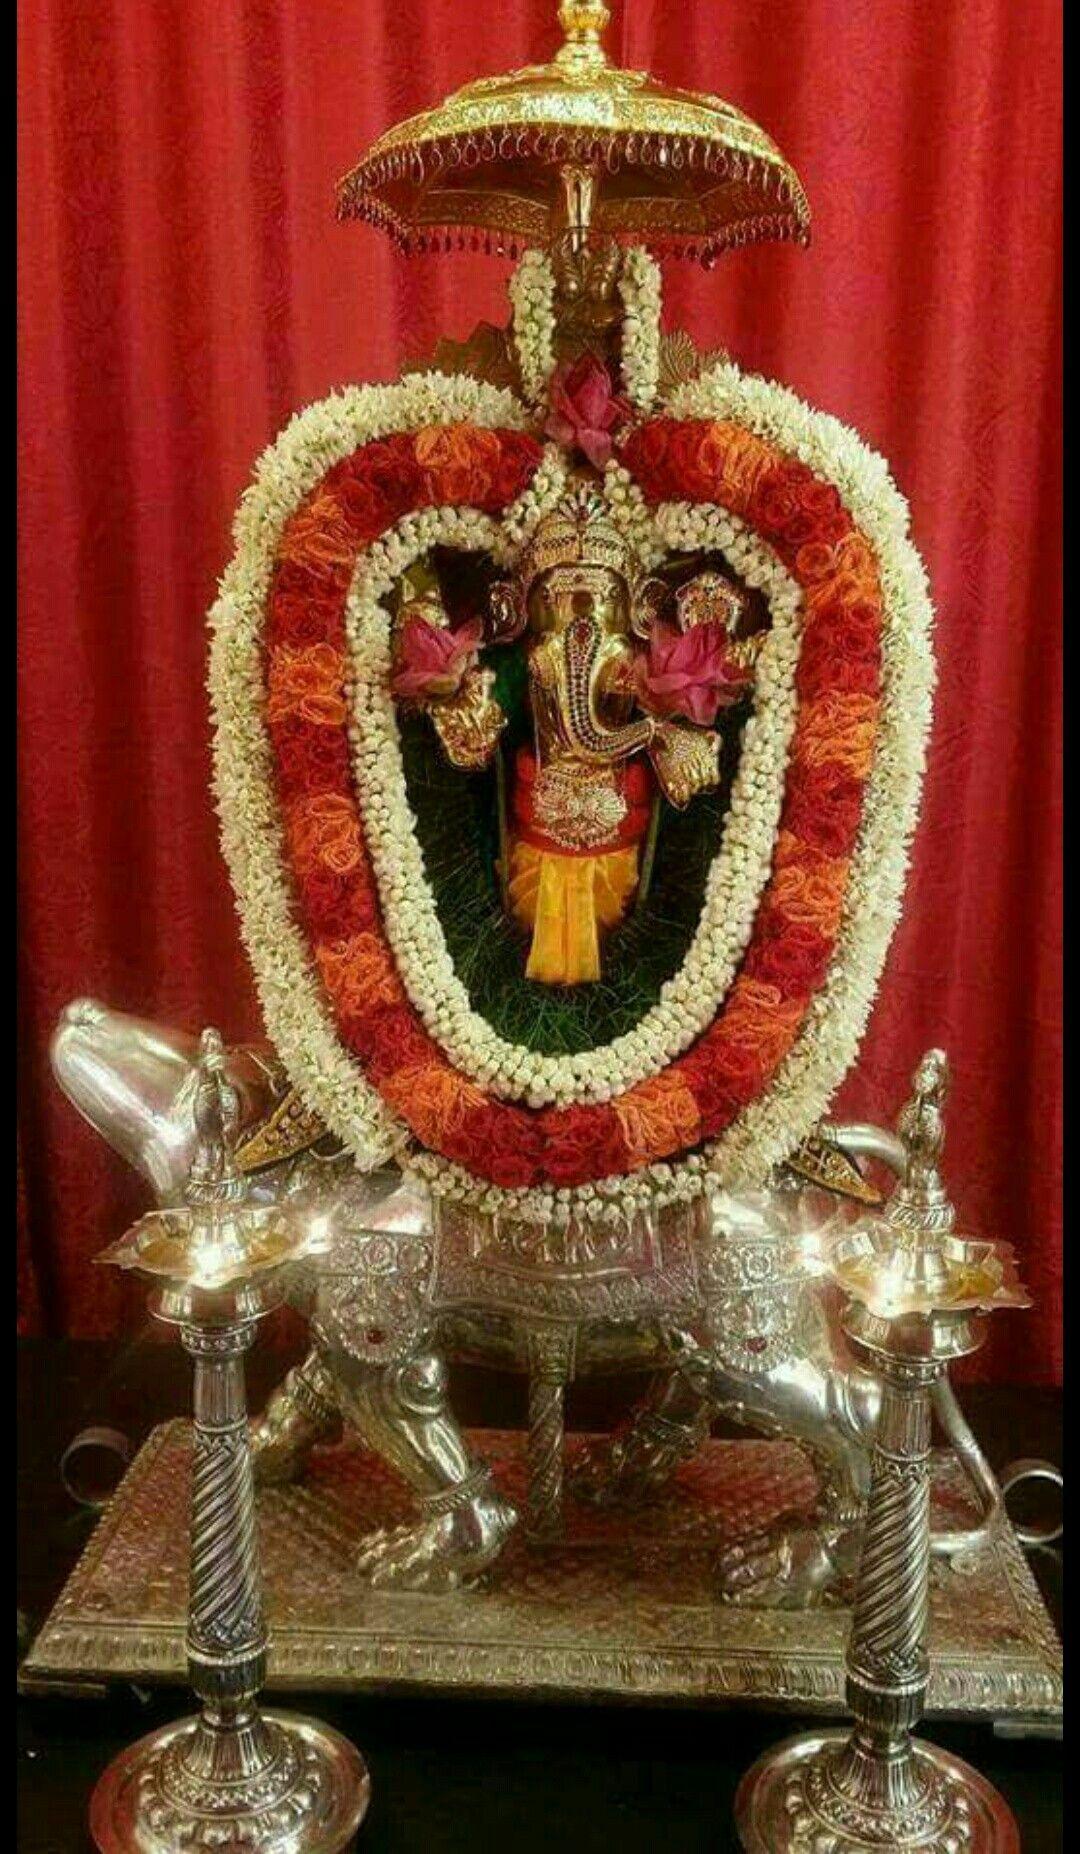 Pin By Nalini On God Lord Ganesha Painting Shiva Statue Essay